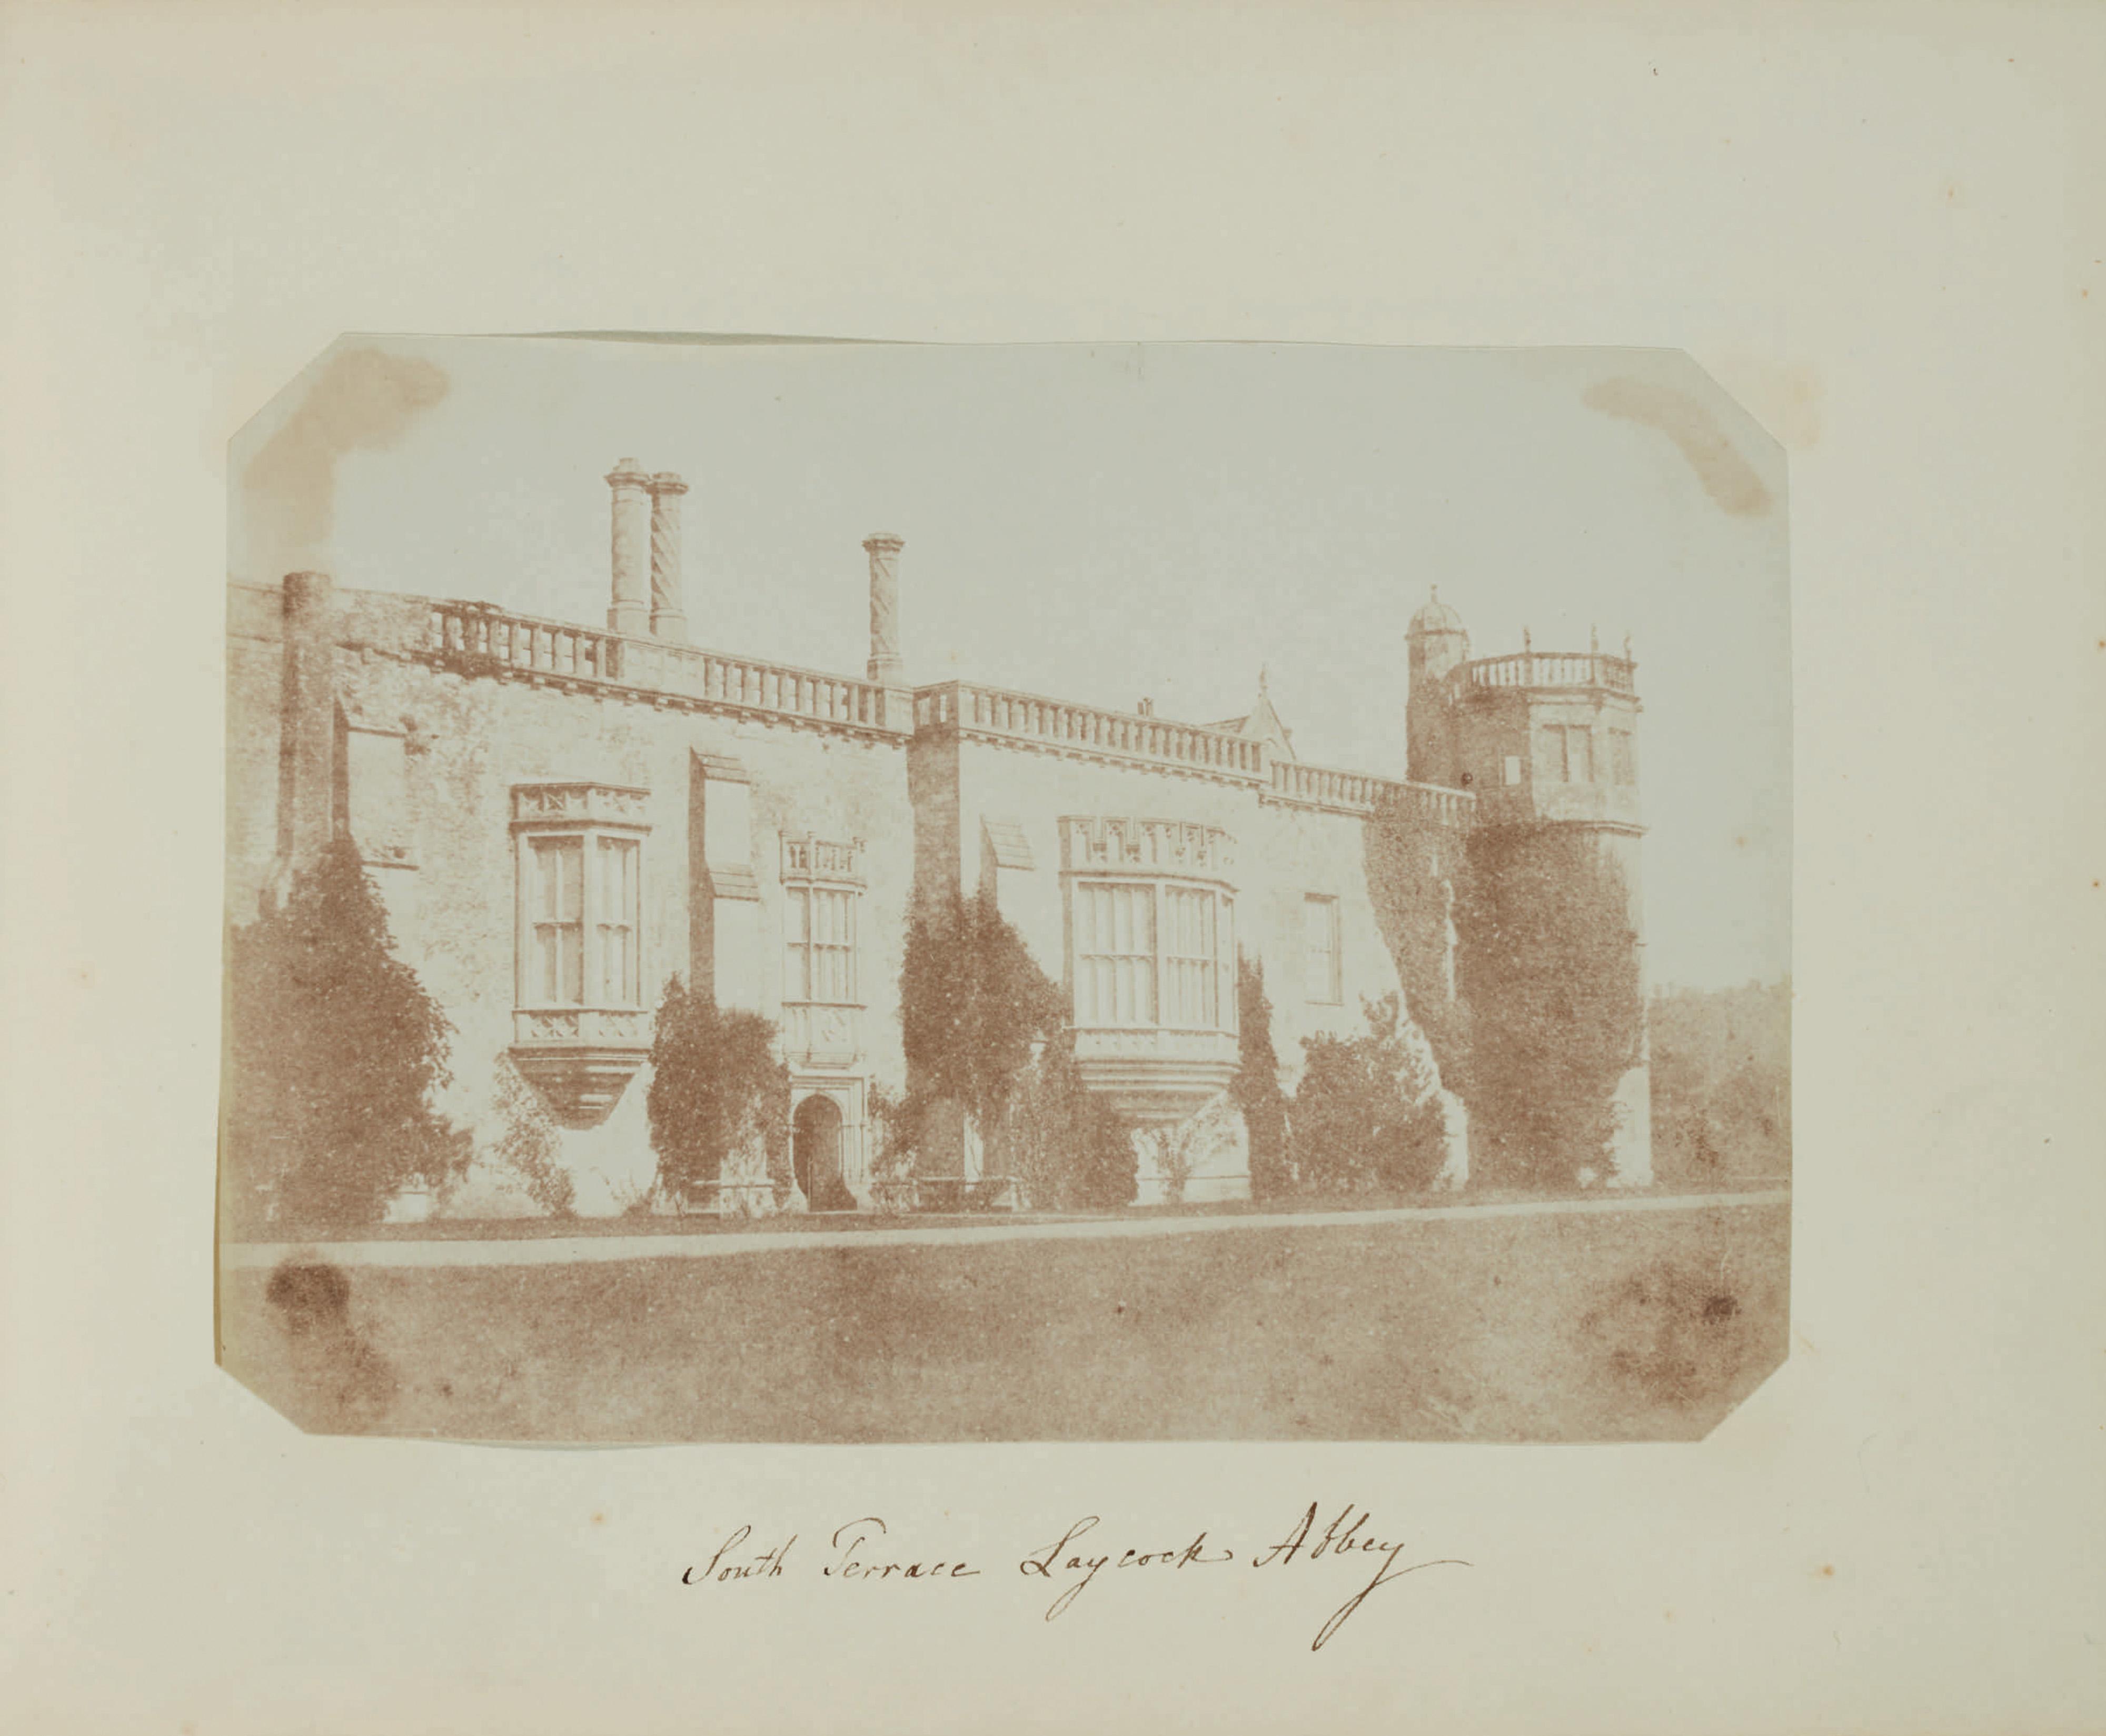 Fotó: William Henry Fox Talbot:<br />South Terrace, Lacock Abbey [towards Sharington's Tower] (c. 1841)<br />William Henry Fox Talbot Archive<br />Courtesy of Sotheby's